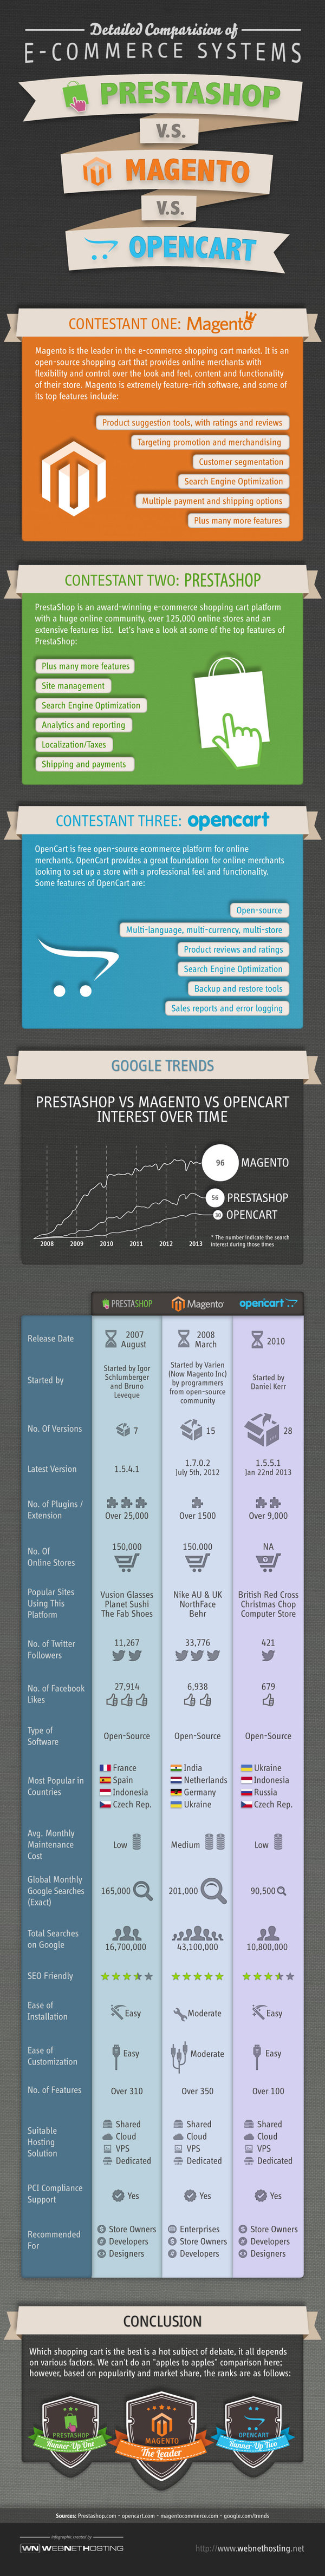 PrestaShop vs. Magento vs. Open Cart - InfoGraphic